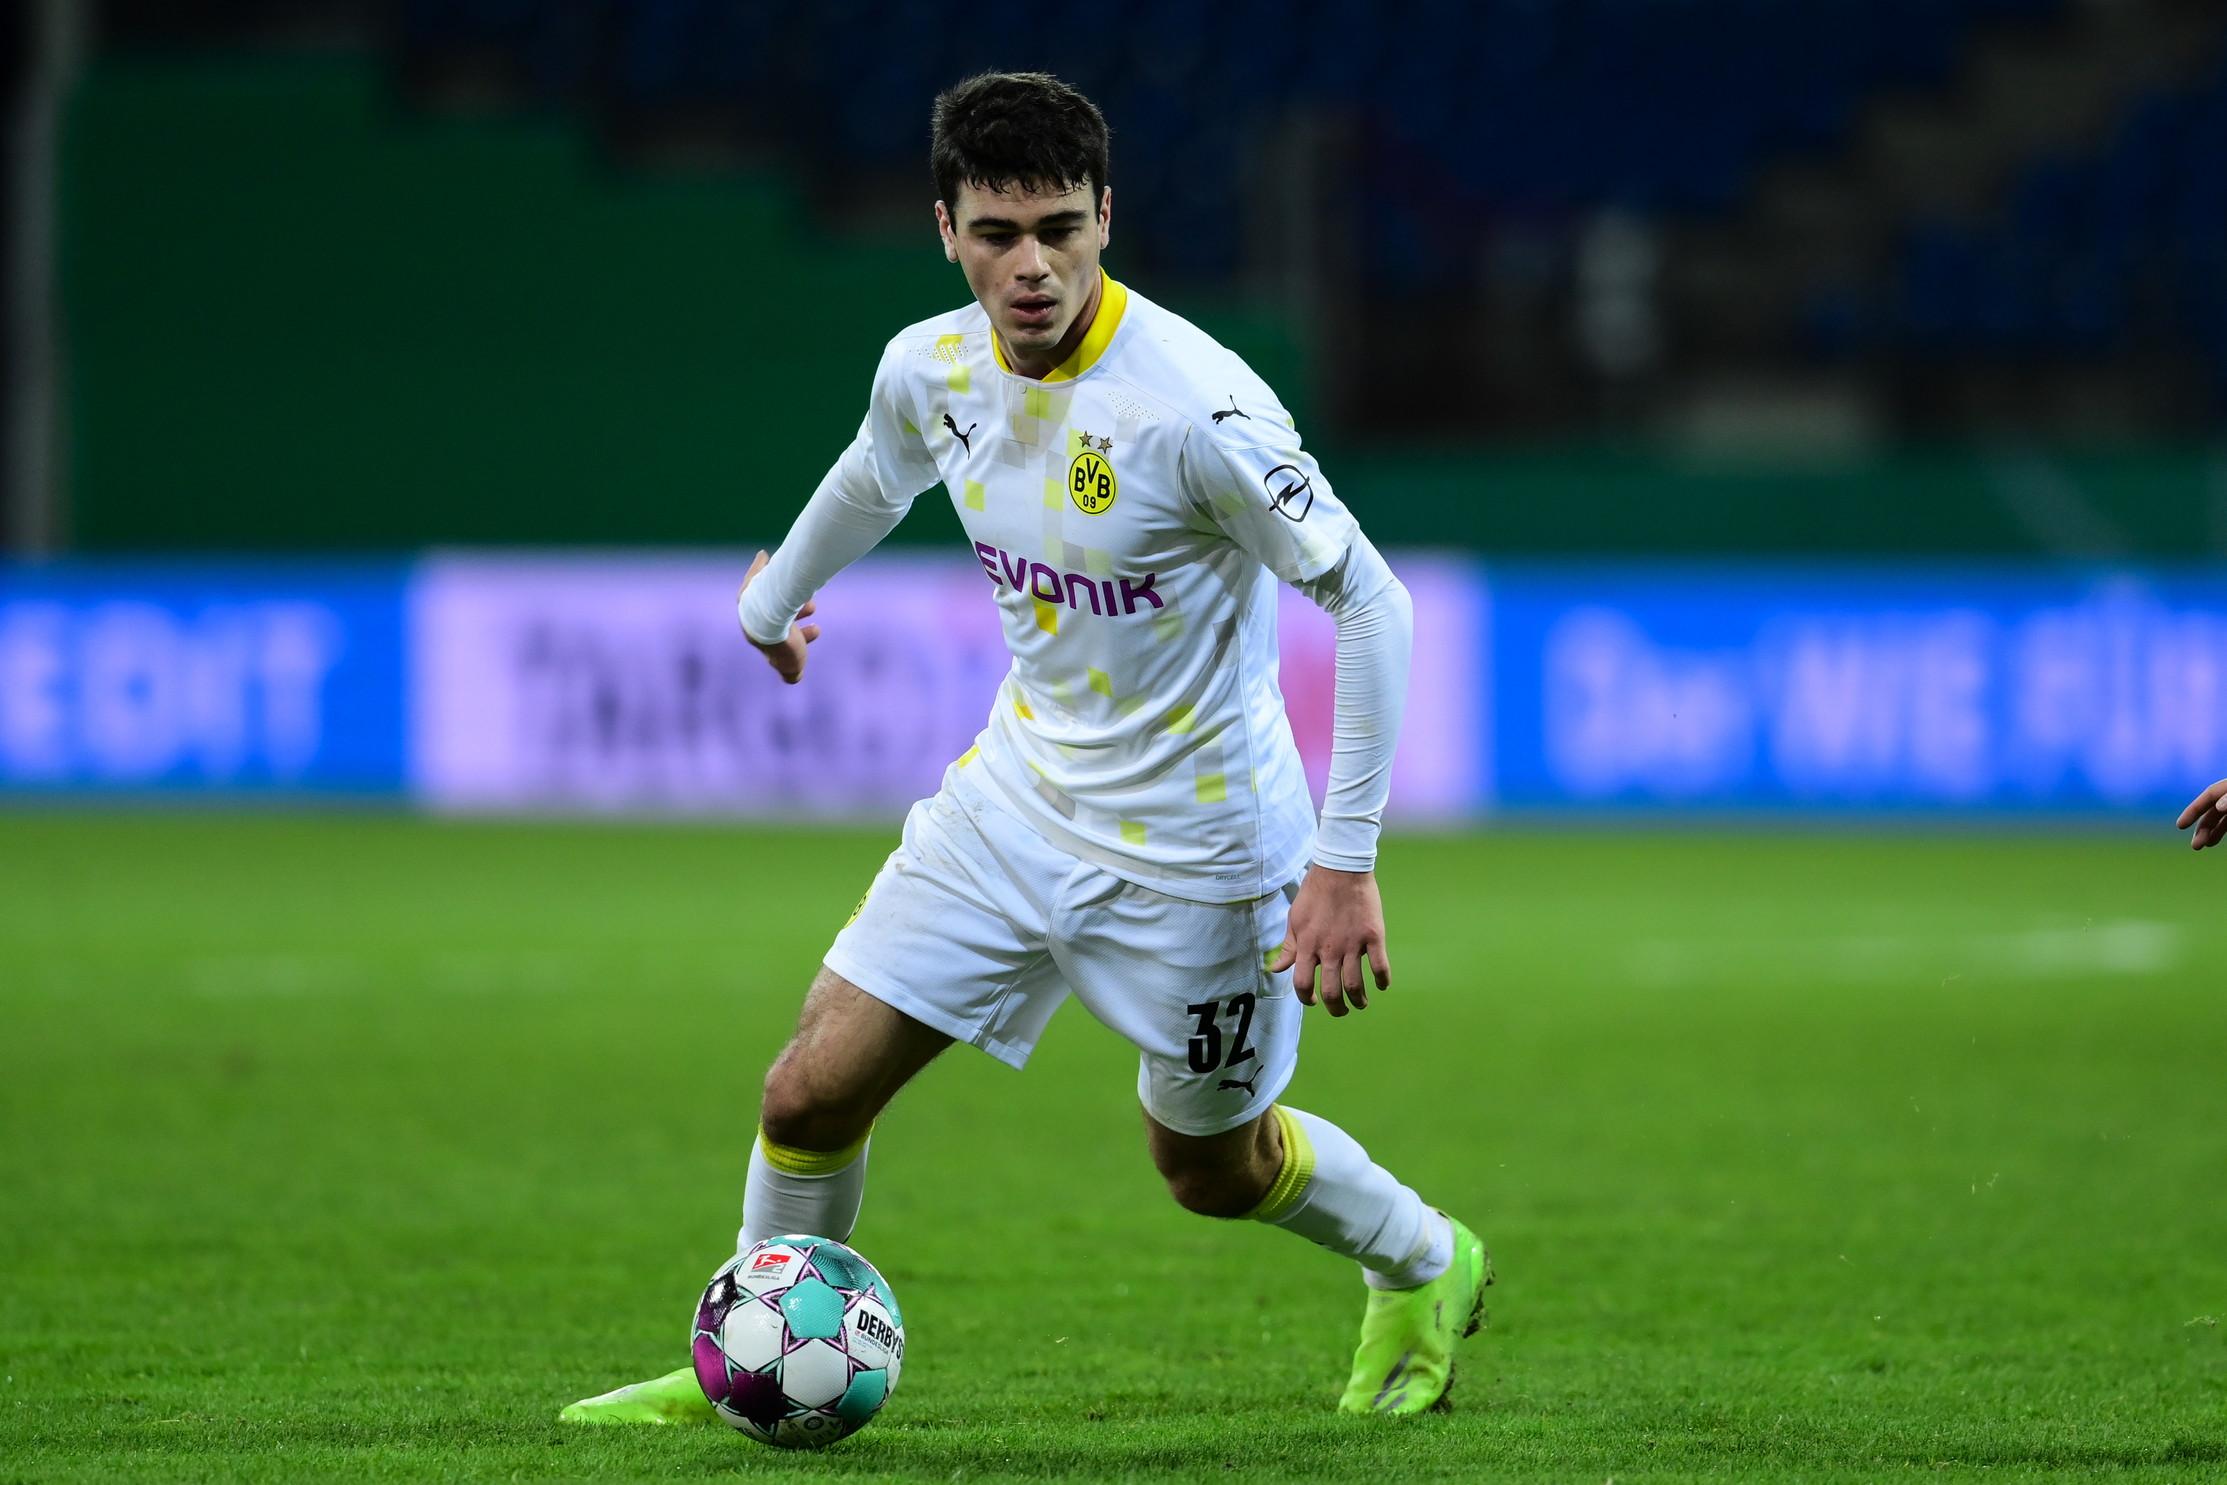 Centrocampista:Giovanni Reyna, 18 anni (Dortmund)